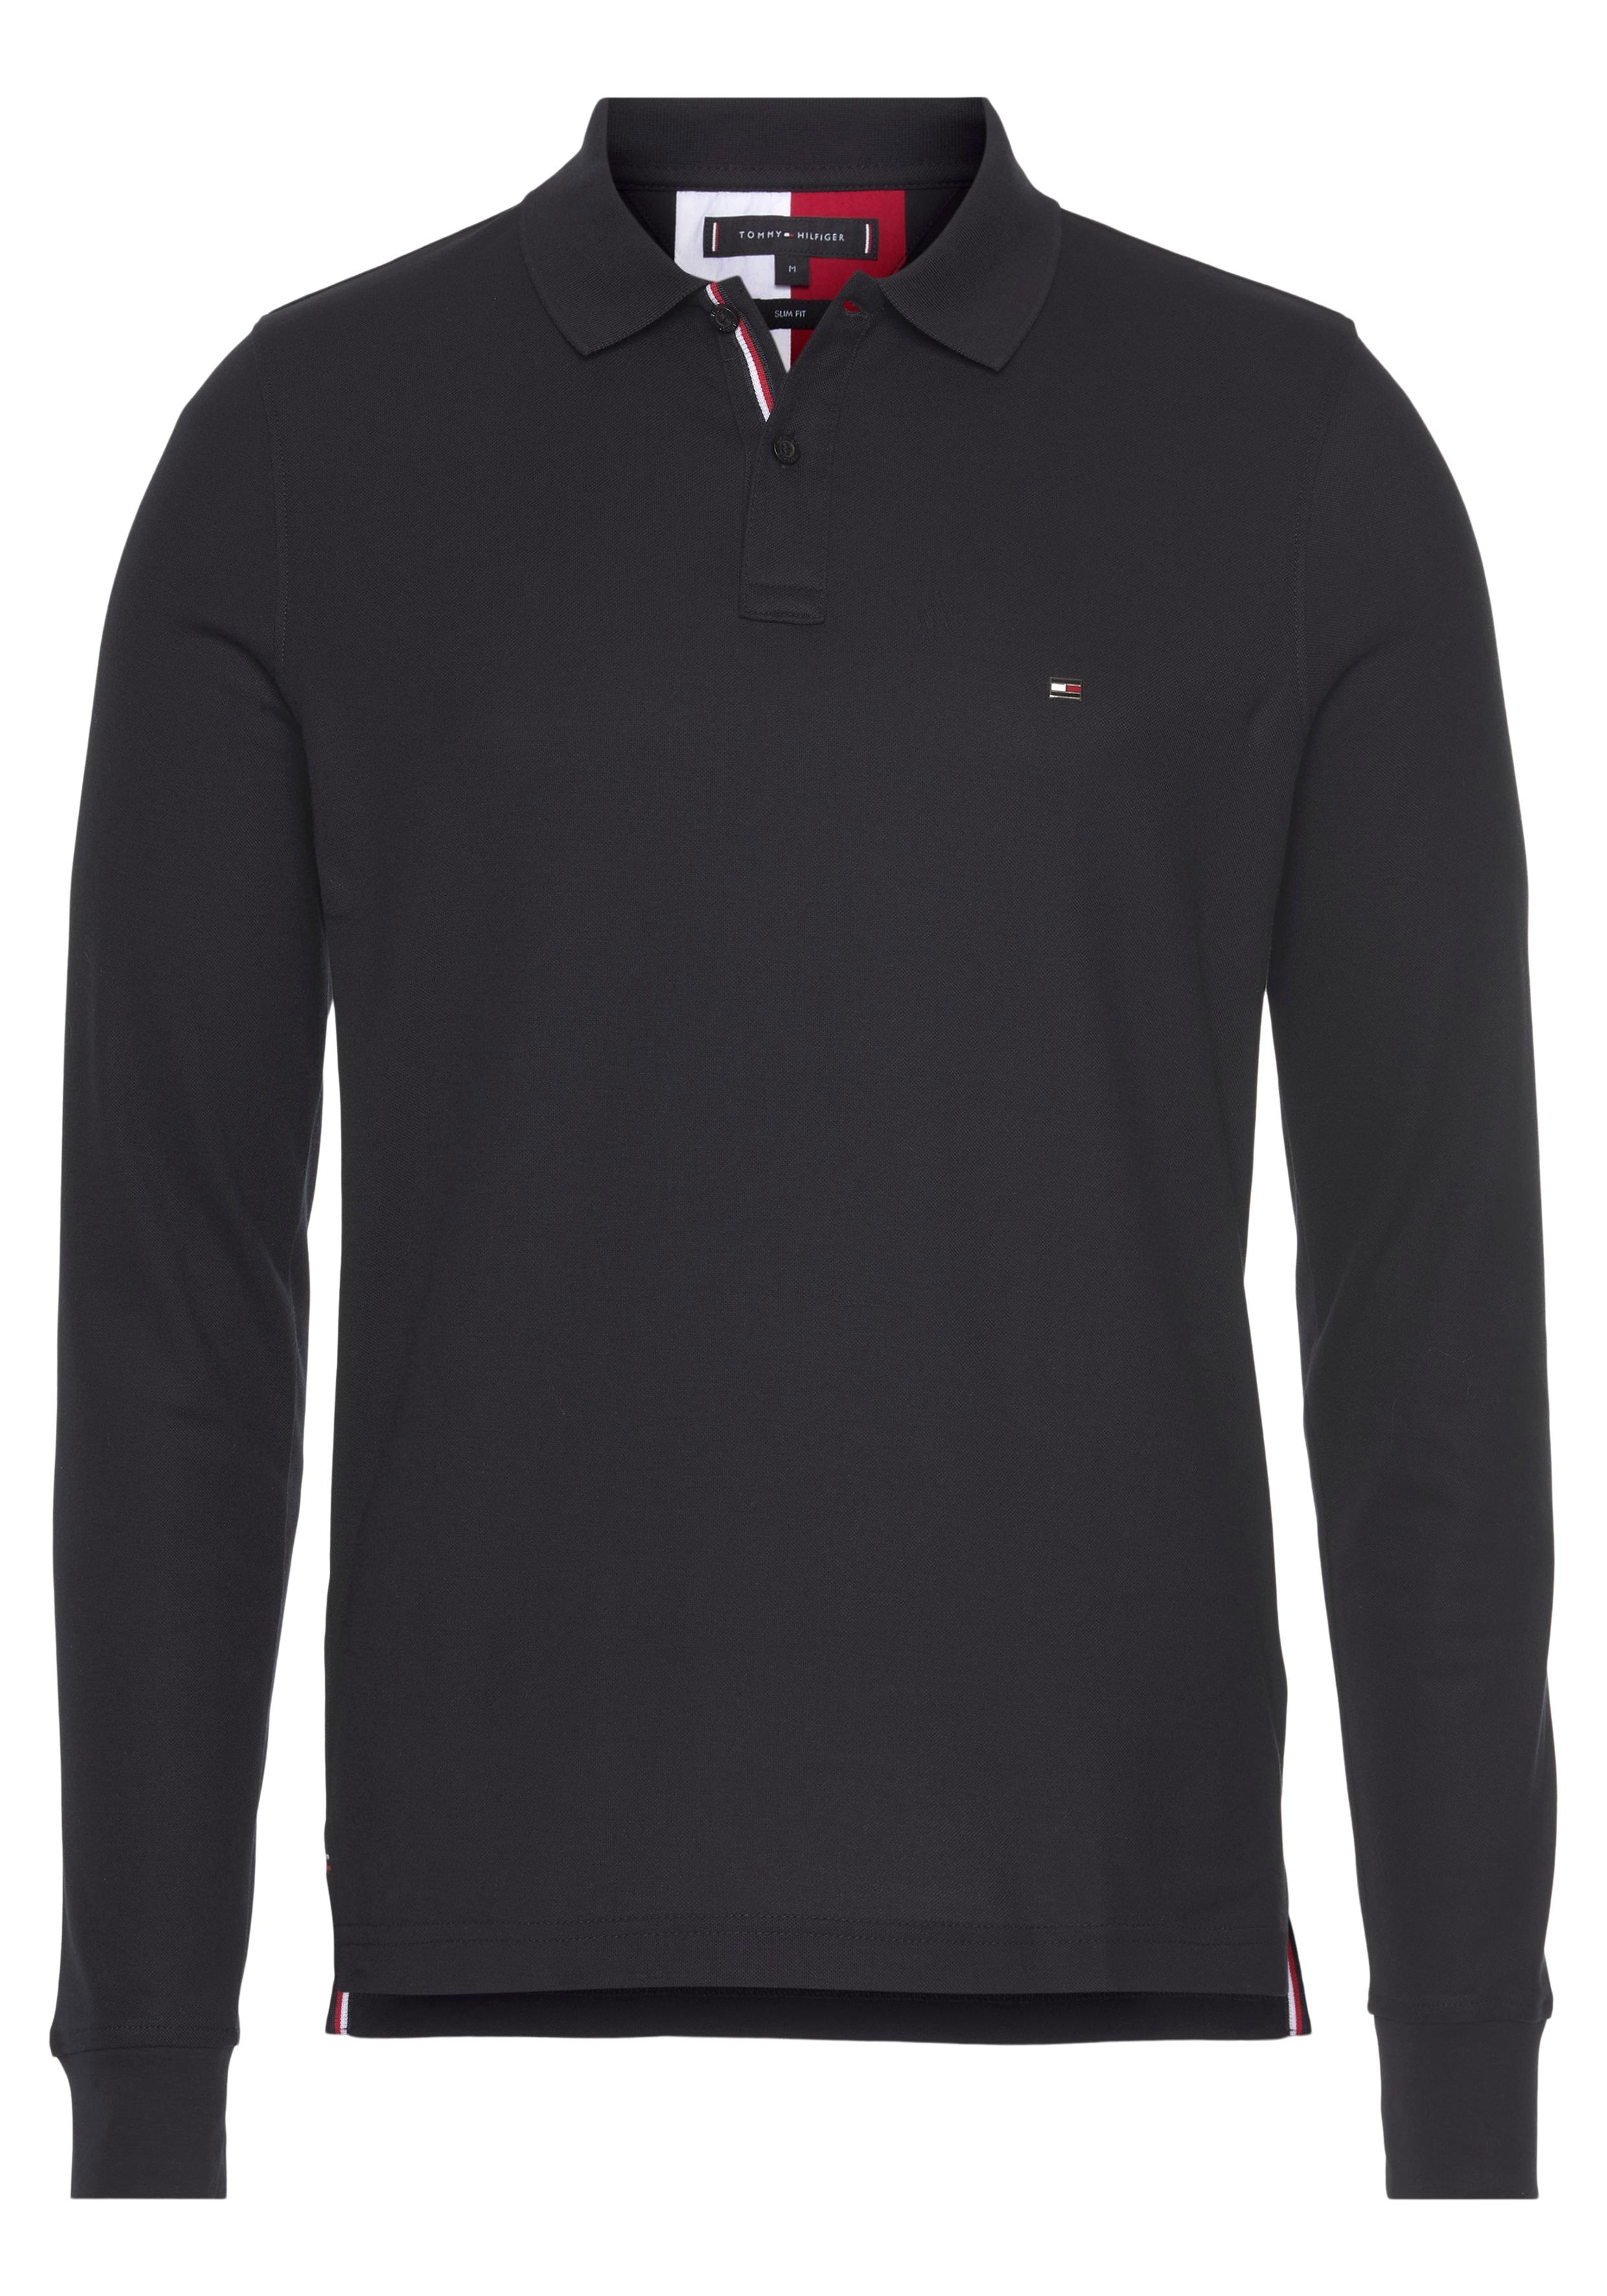 tommy hilfiger -  Langarm-Poloshirt LUXURY STRETCH SLIM LS POLO